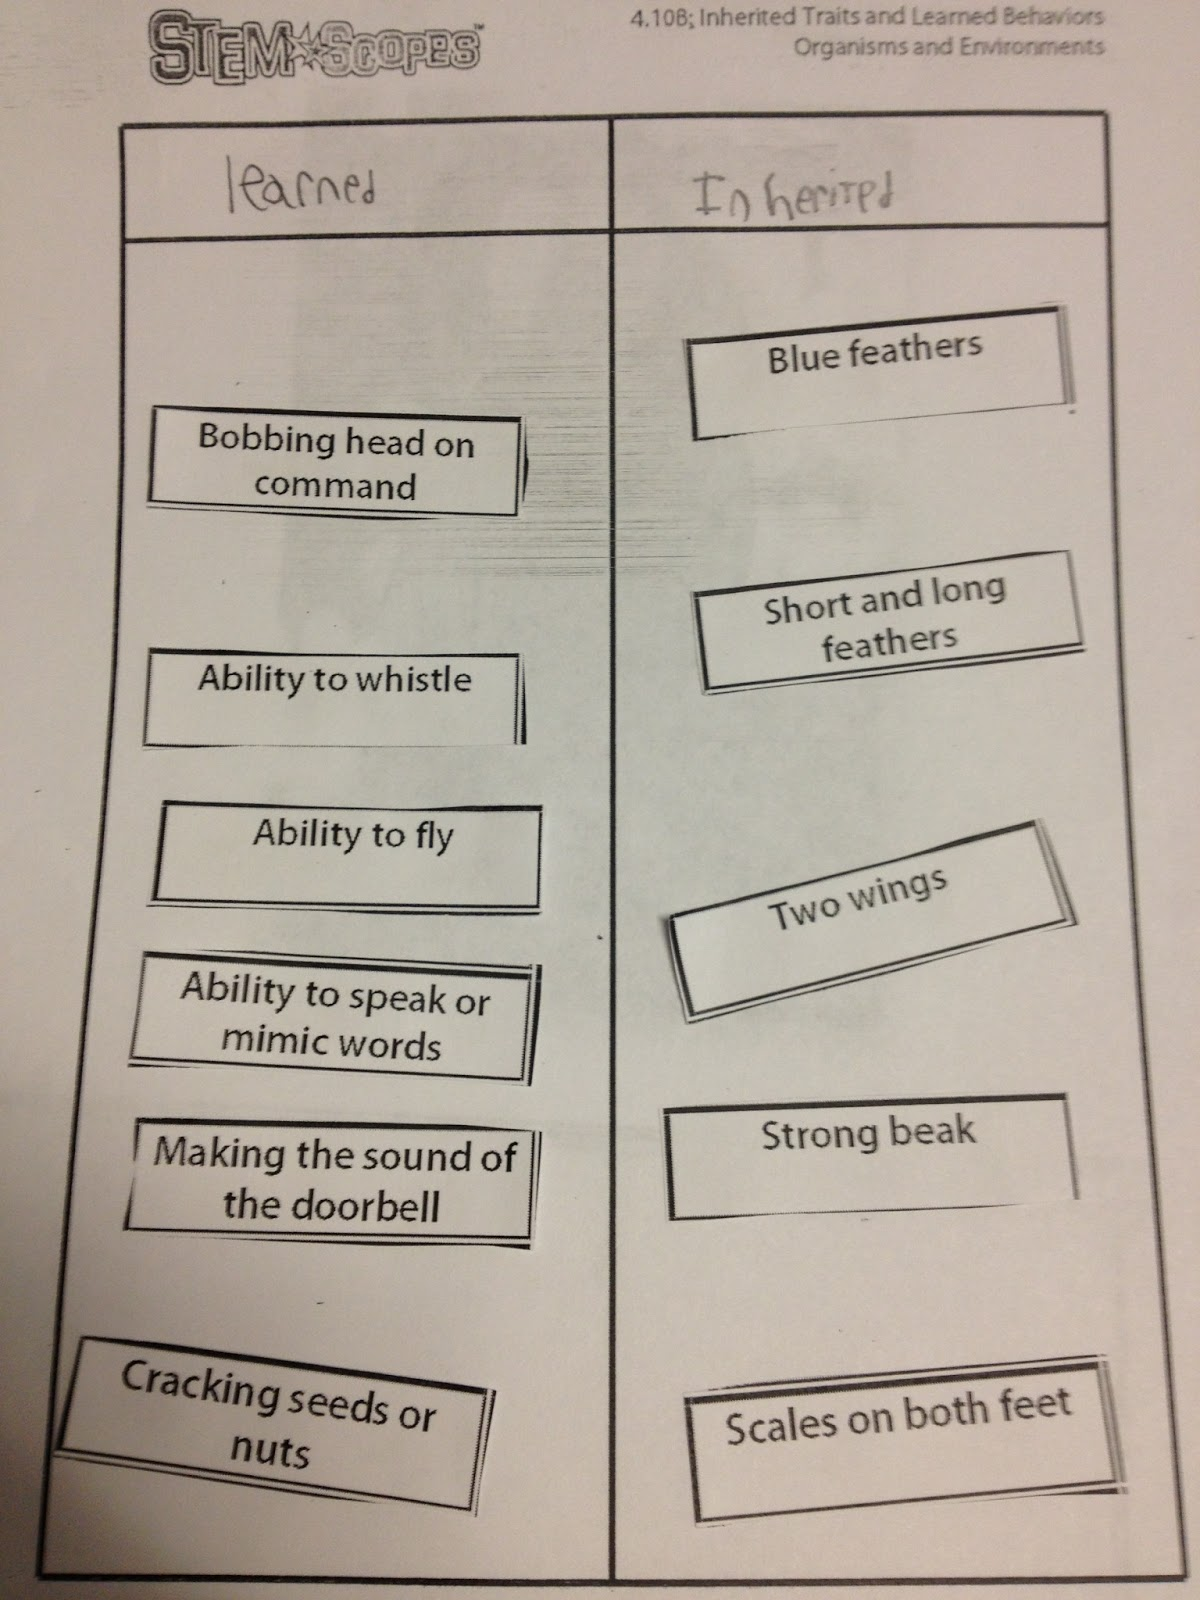 32 Inherited Traits Worksheet 5th Grade - Worksheet Resource Plans [ 1600 x 1200 Pixel ]